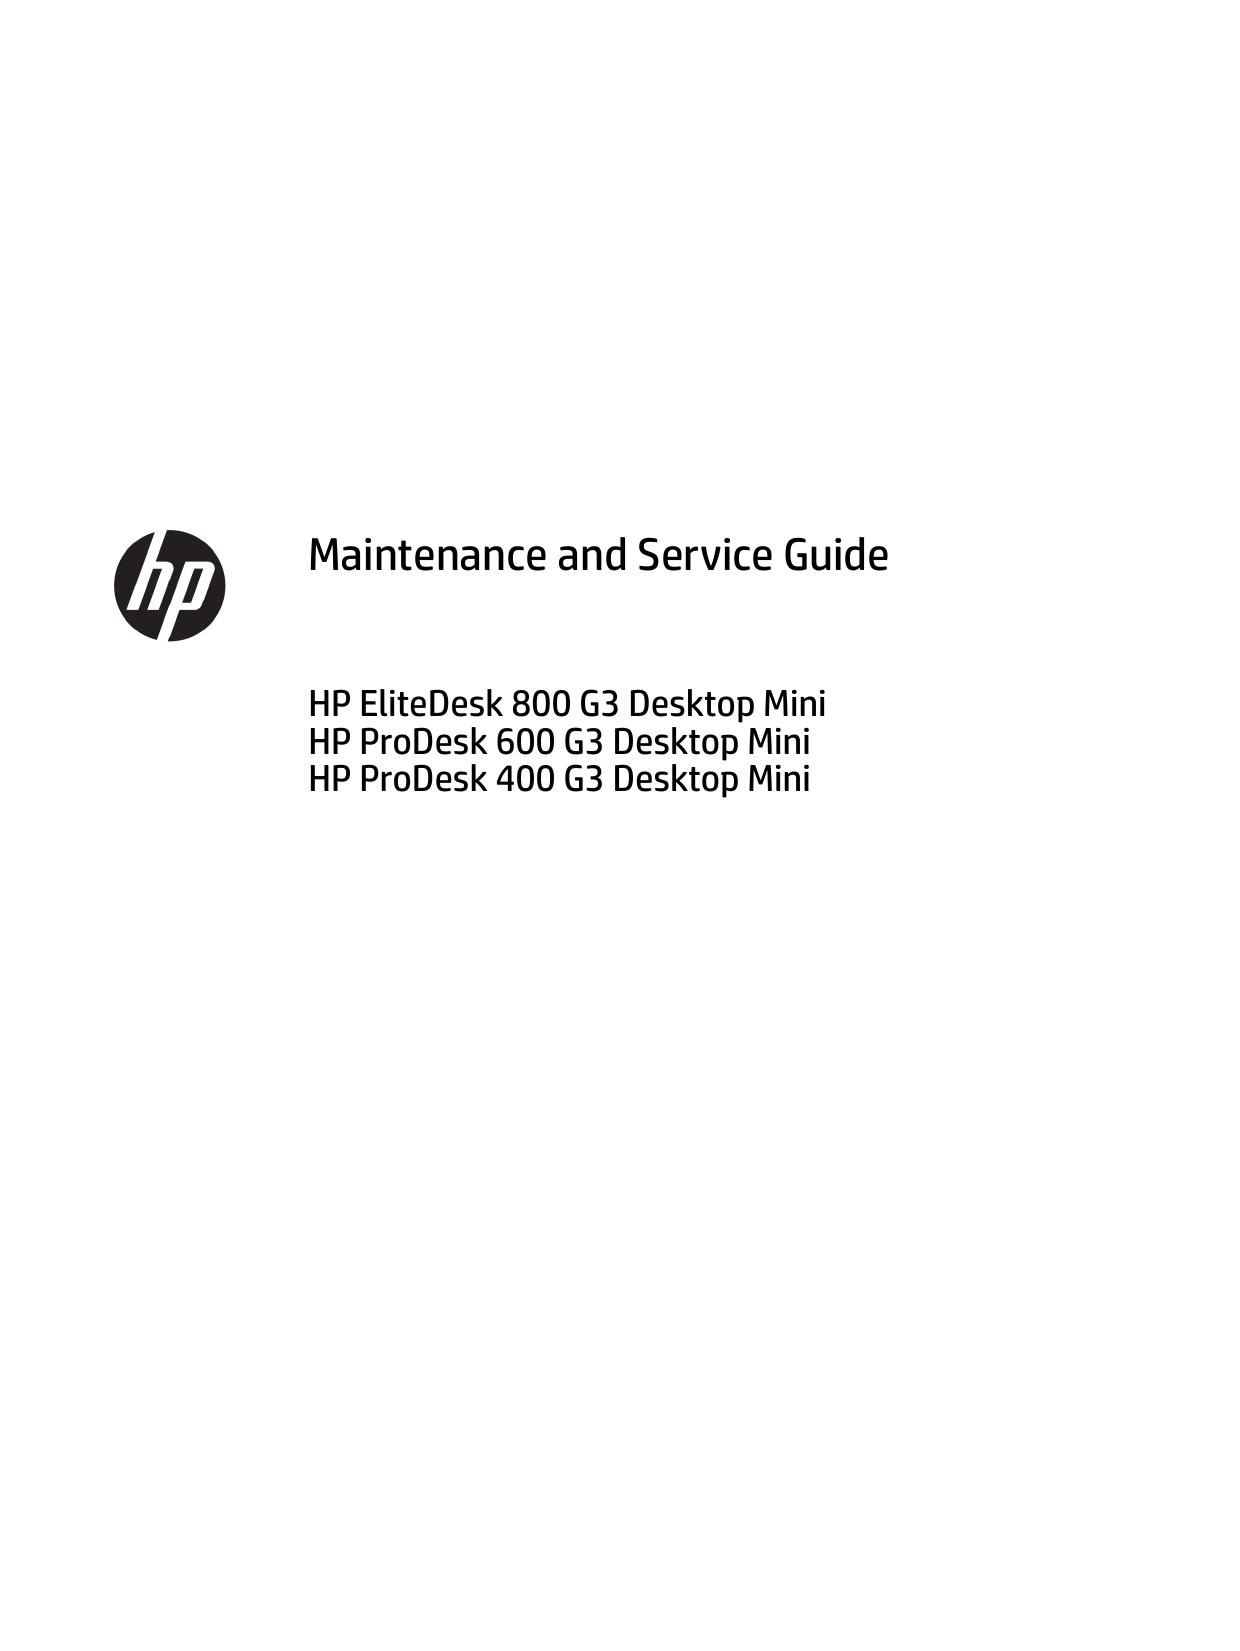 HP EliteDesk 800 65W G3 Desktop Mini PC User manual